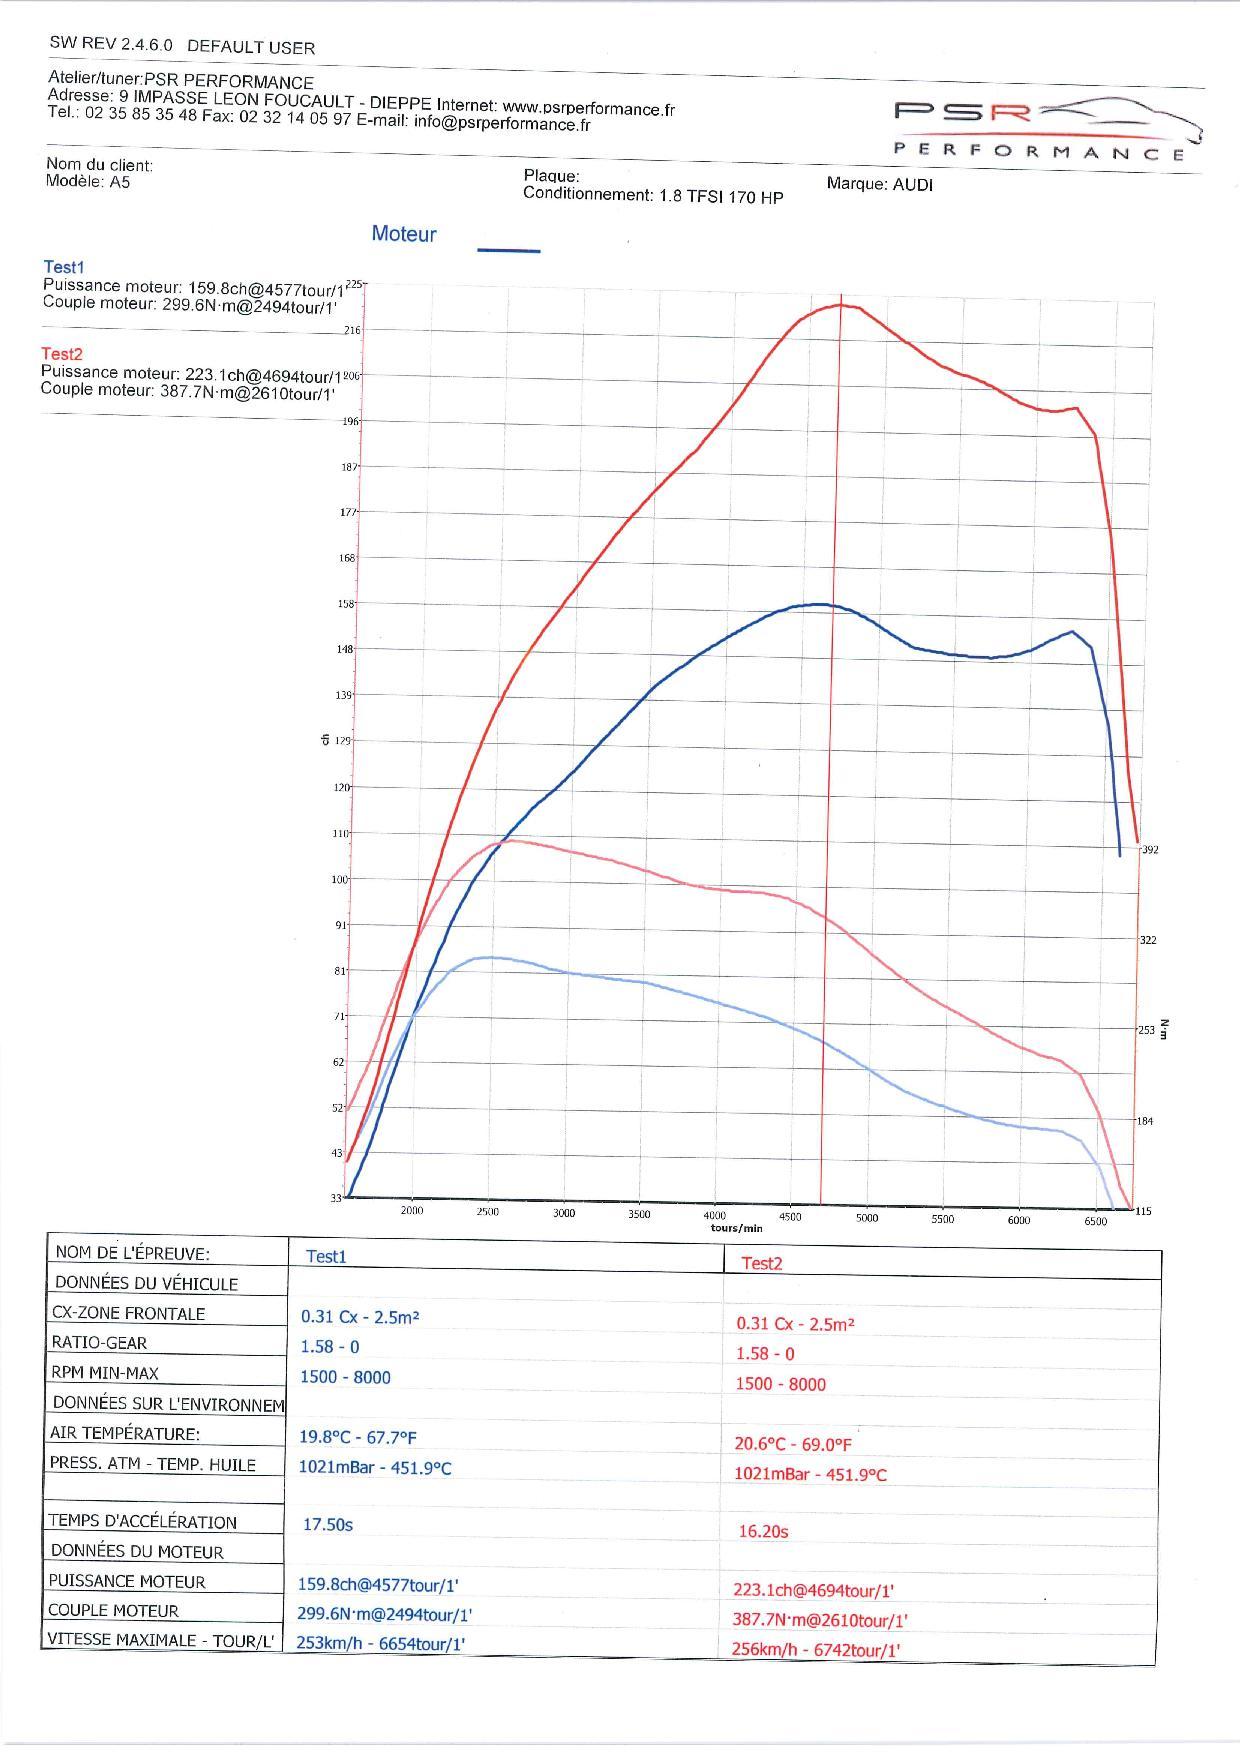 AUDI A5 1.8 TFSI 170 HP